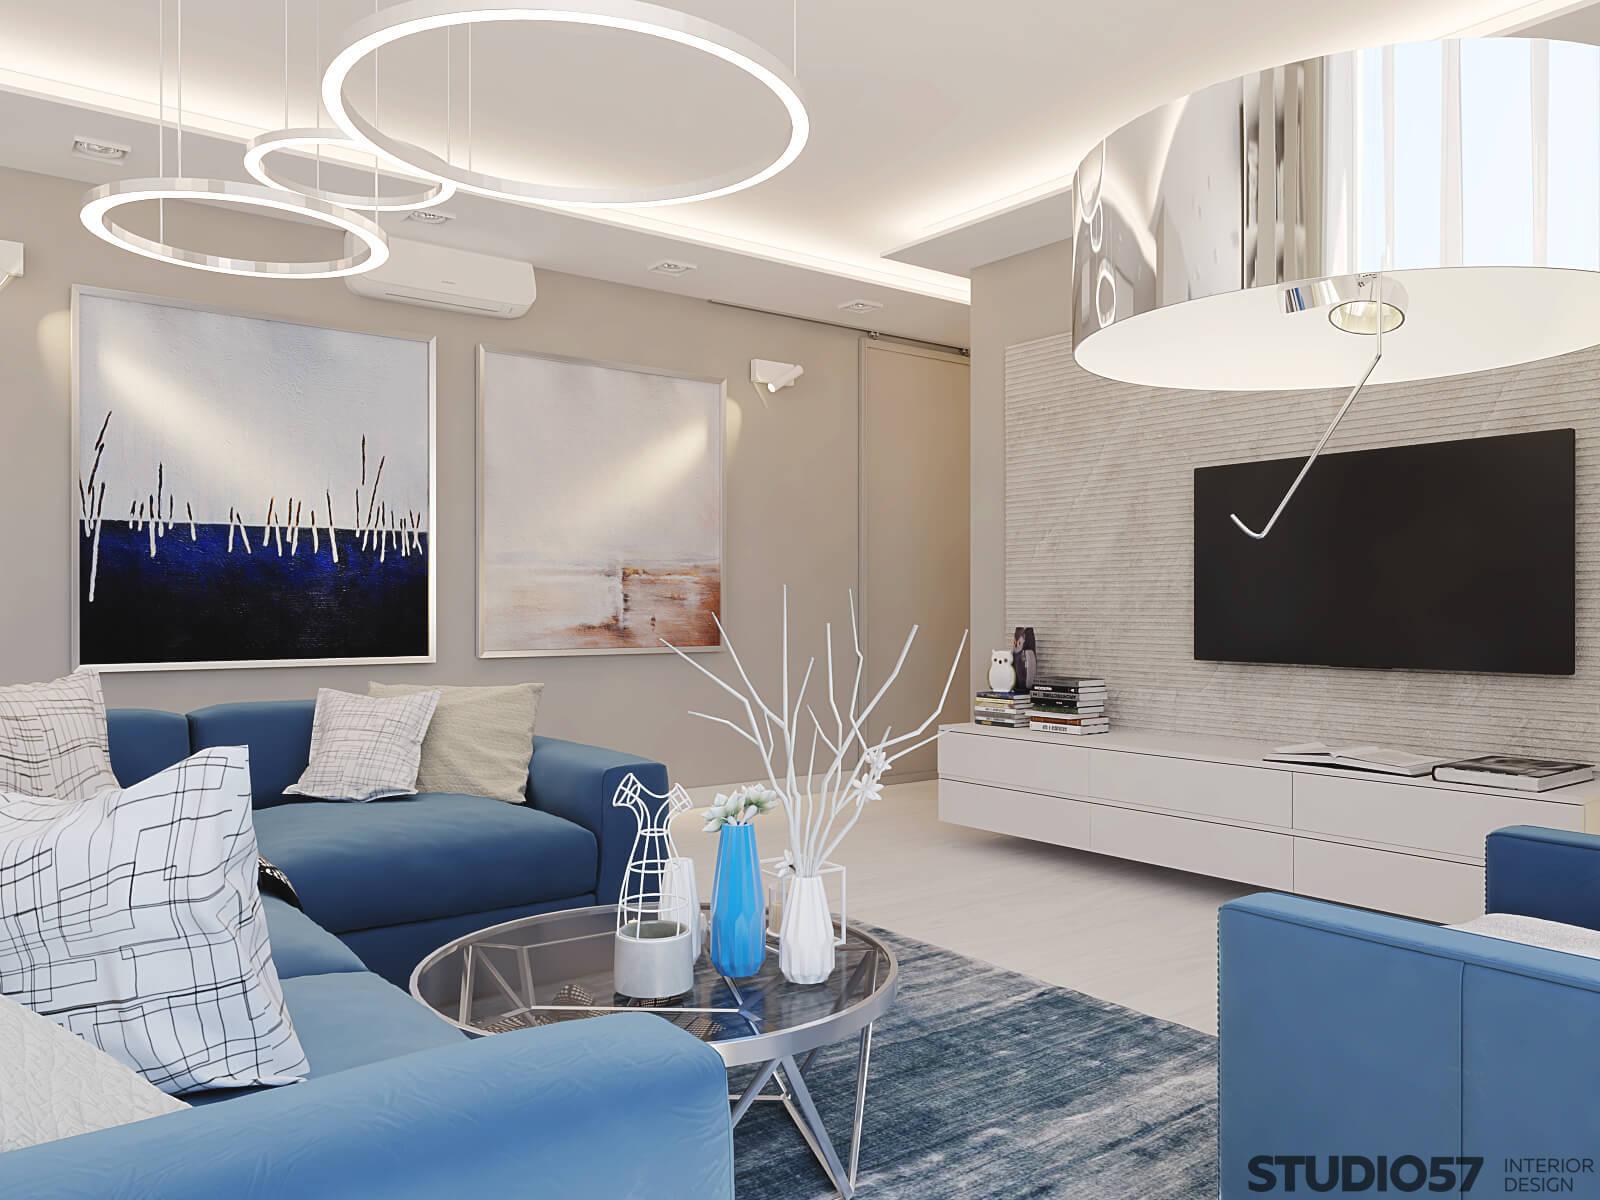 Living room lights in blue